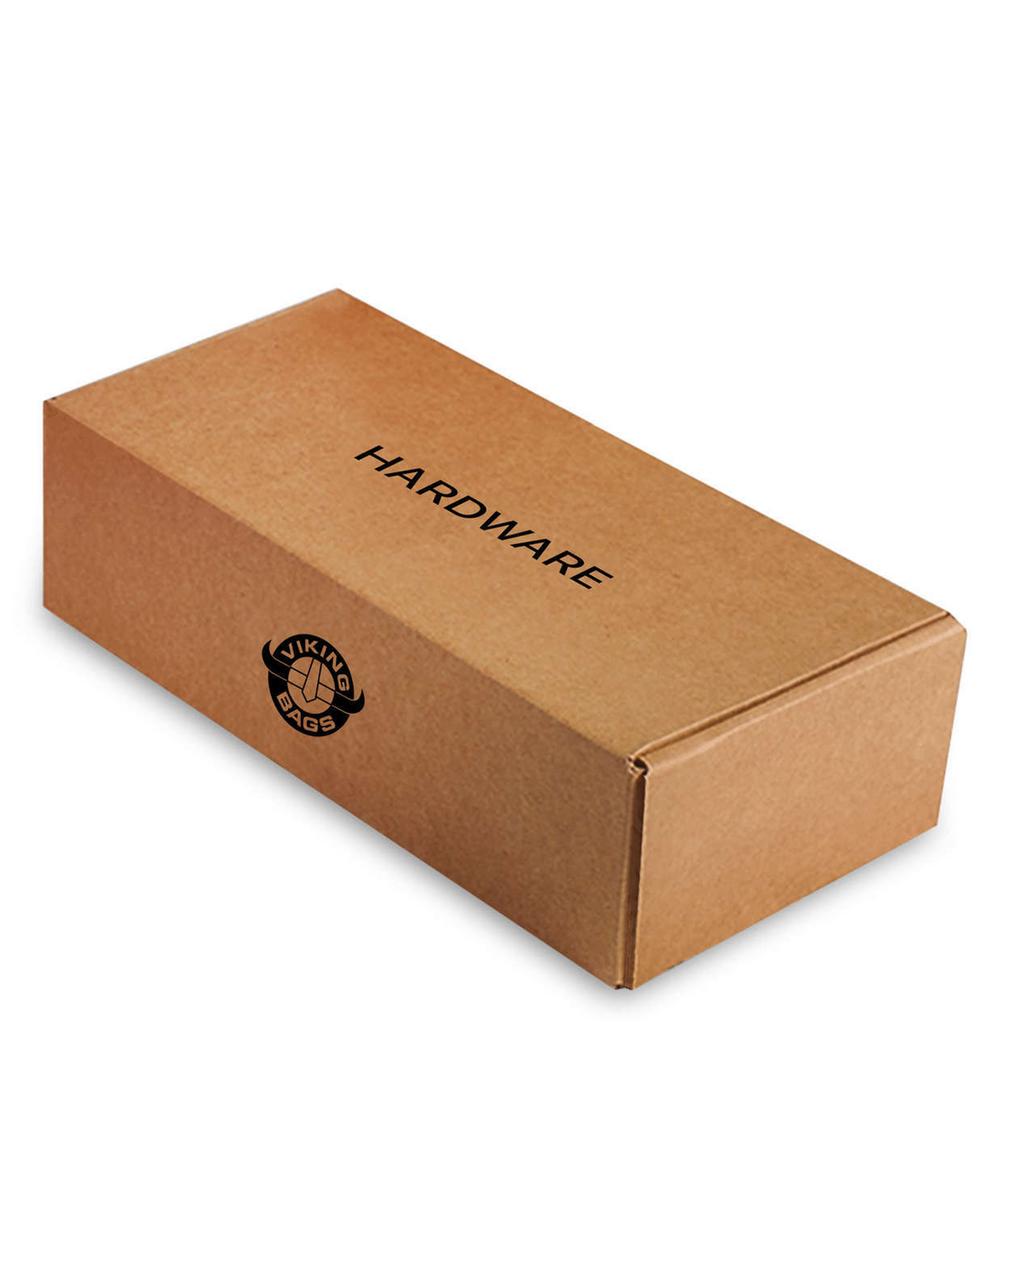 Honda VTX 1300 C Side Pocket Motorcycle Saddlebags Hardware Box